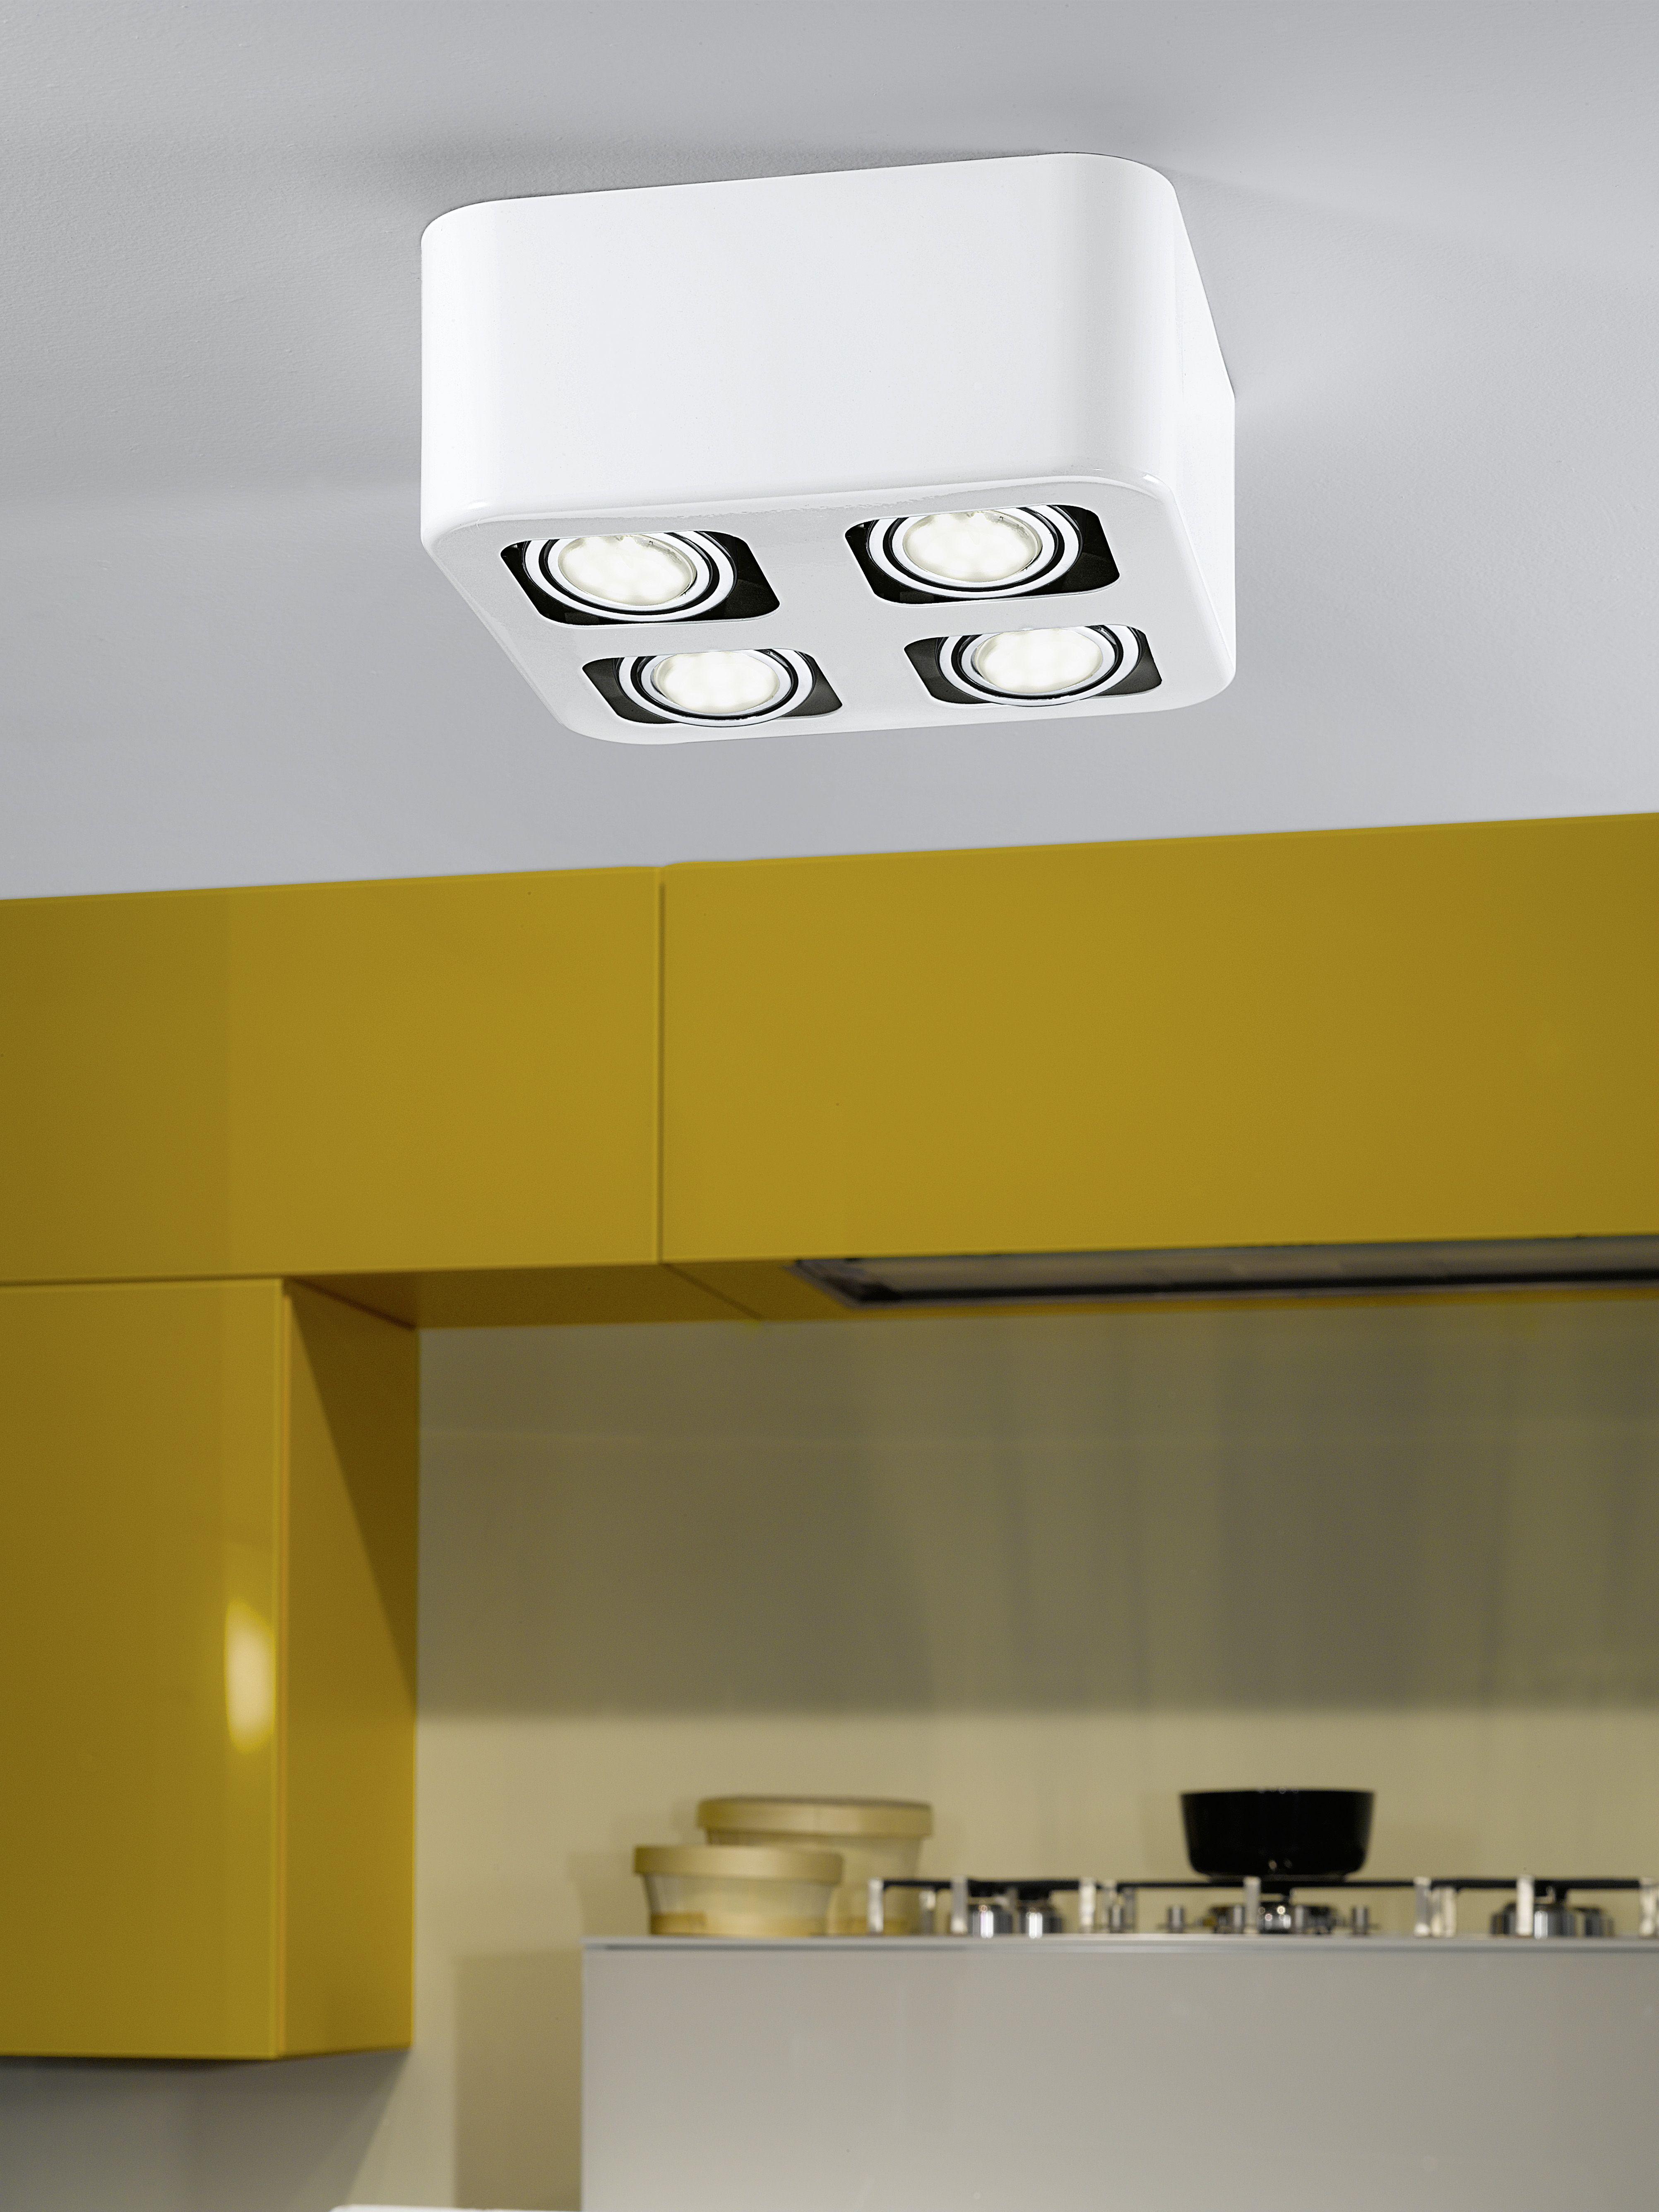 Eglo Lighting Toreno Led White 4 Lamp Surface Mounted